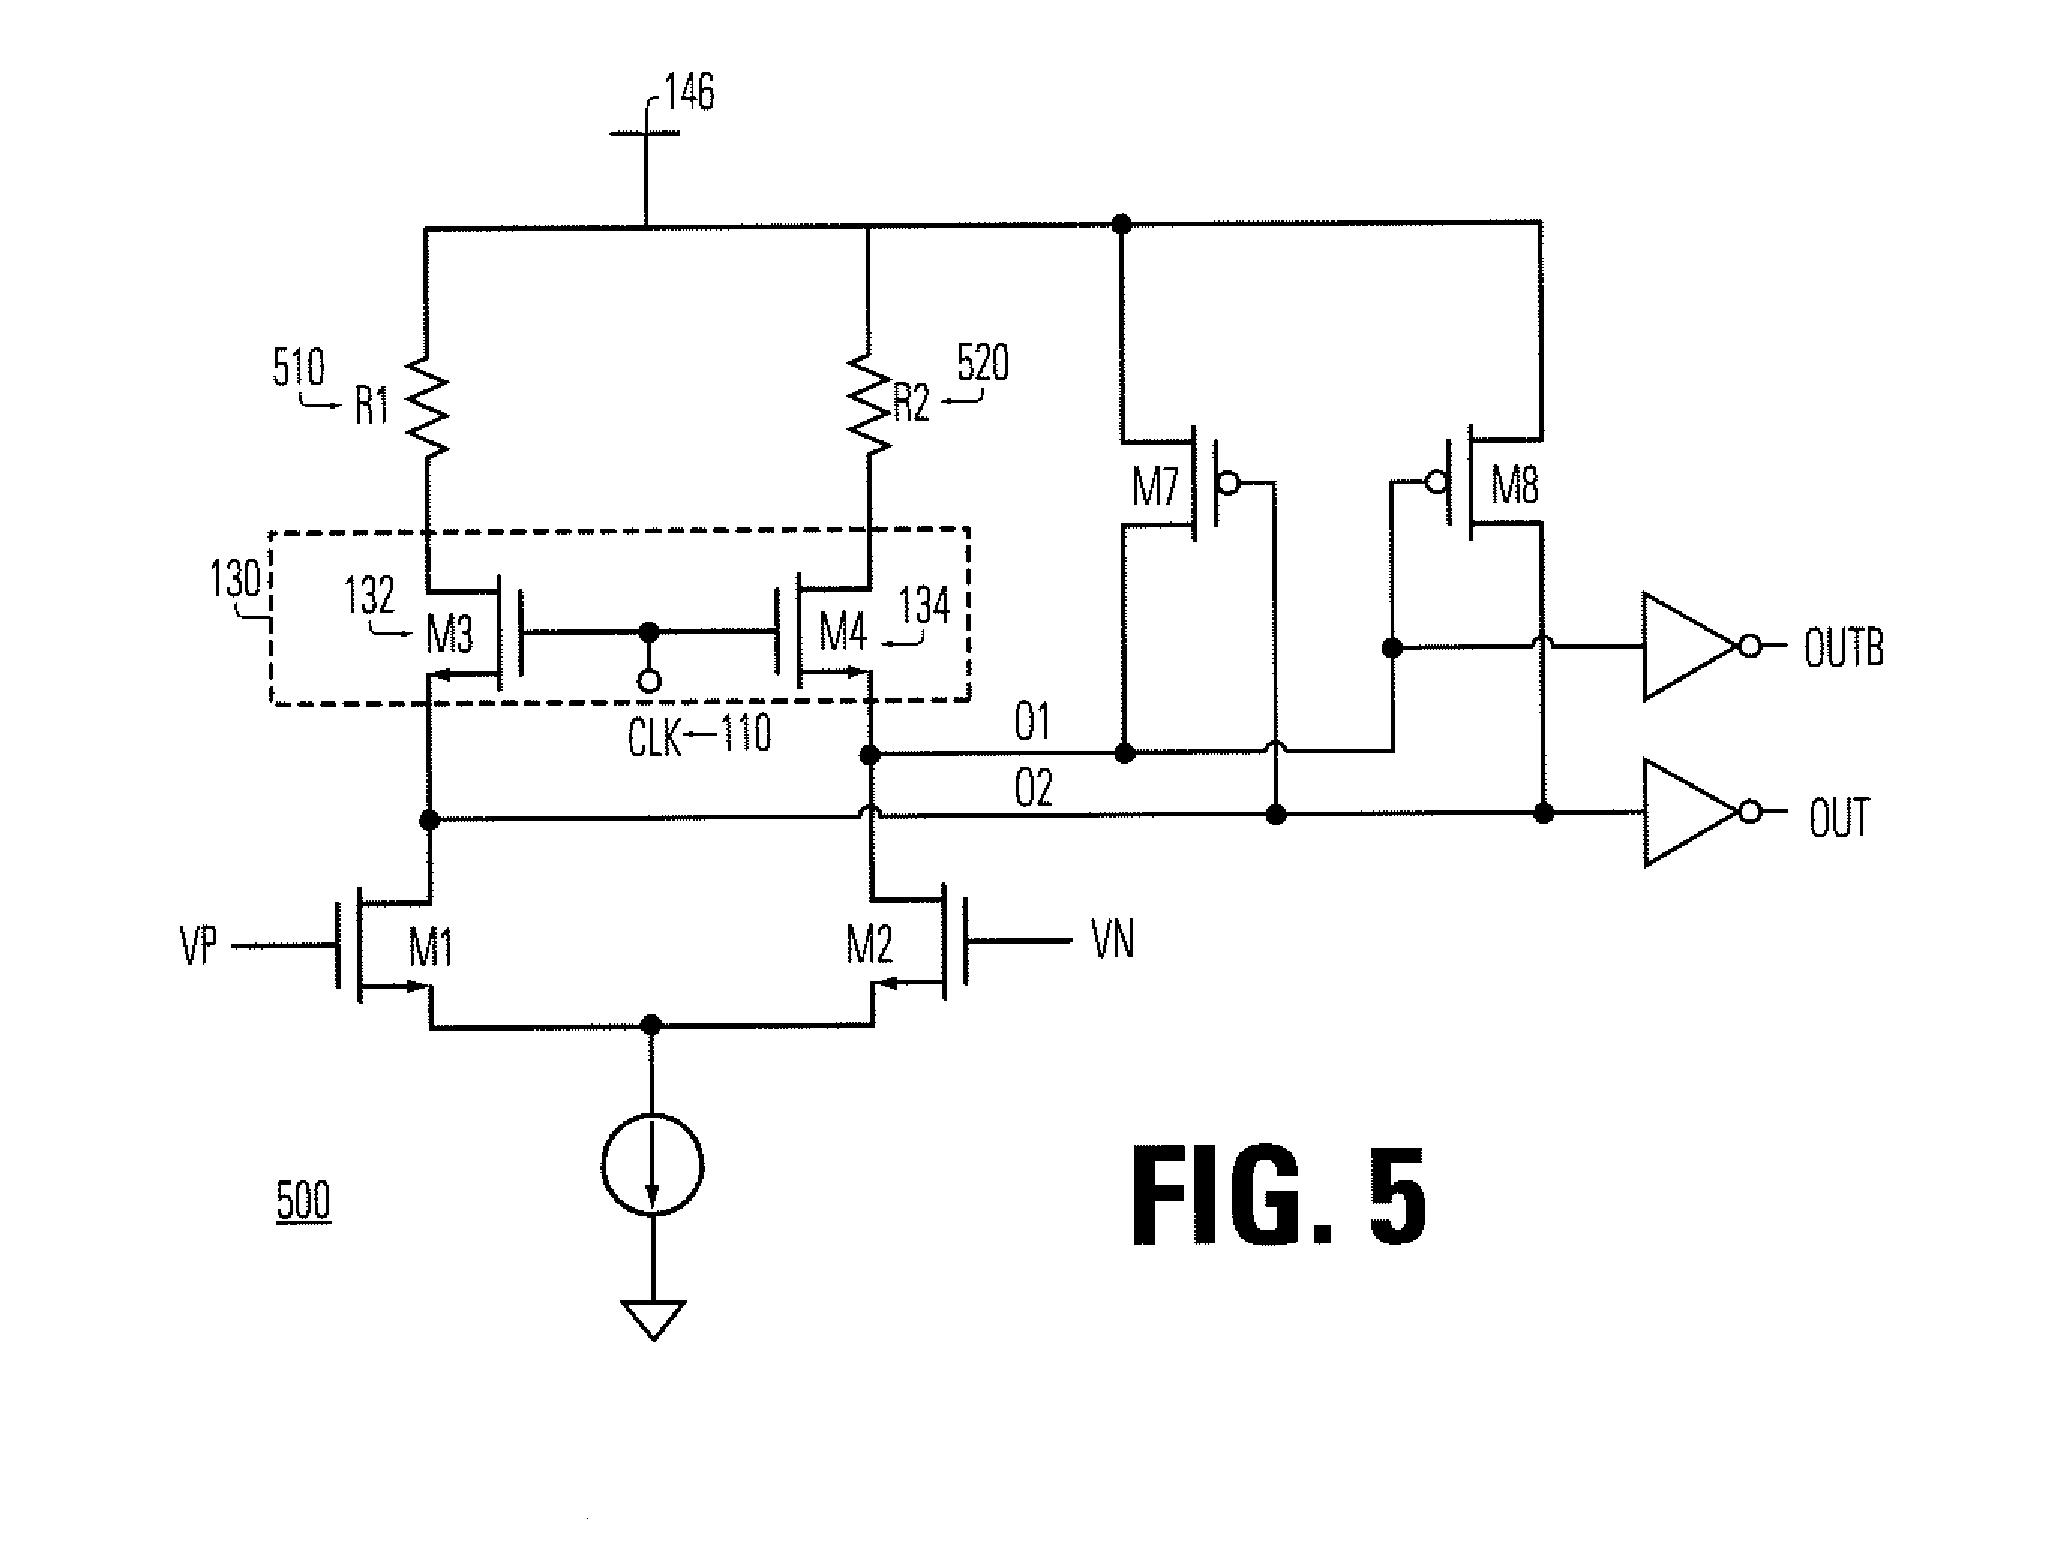 Patent Us7323911 Differential Sense Amplifier Circuit And Method Current Detection Part Diagram Amplifiercircuit Drawing